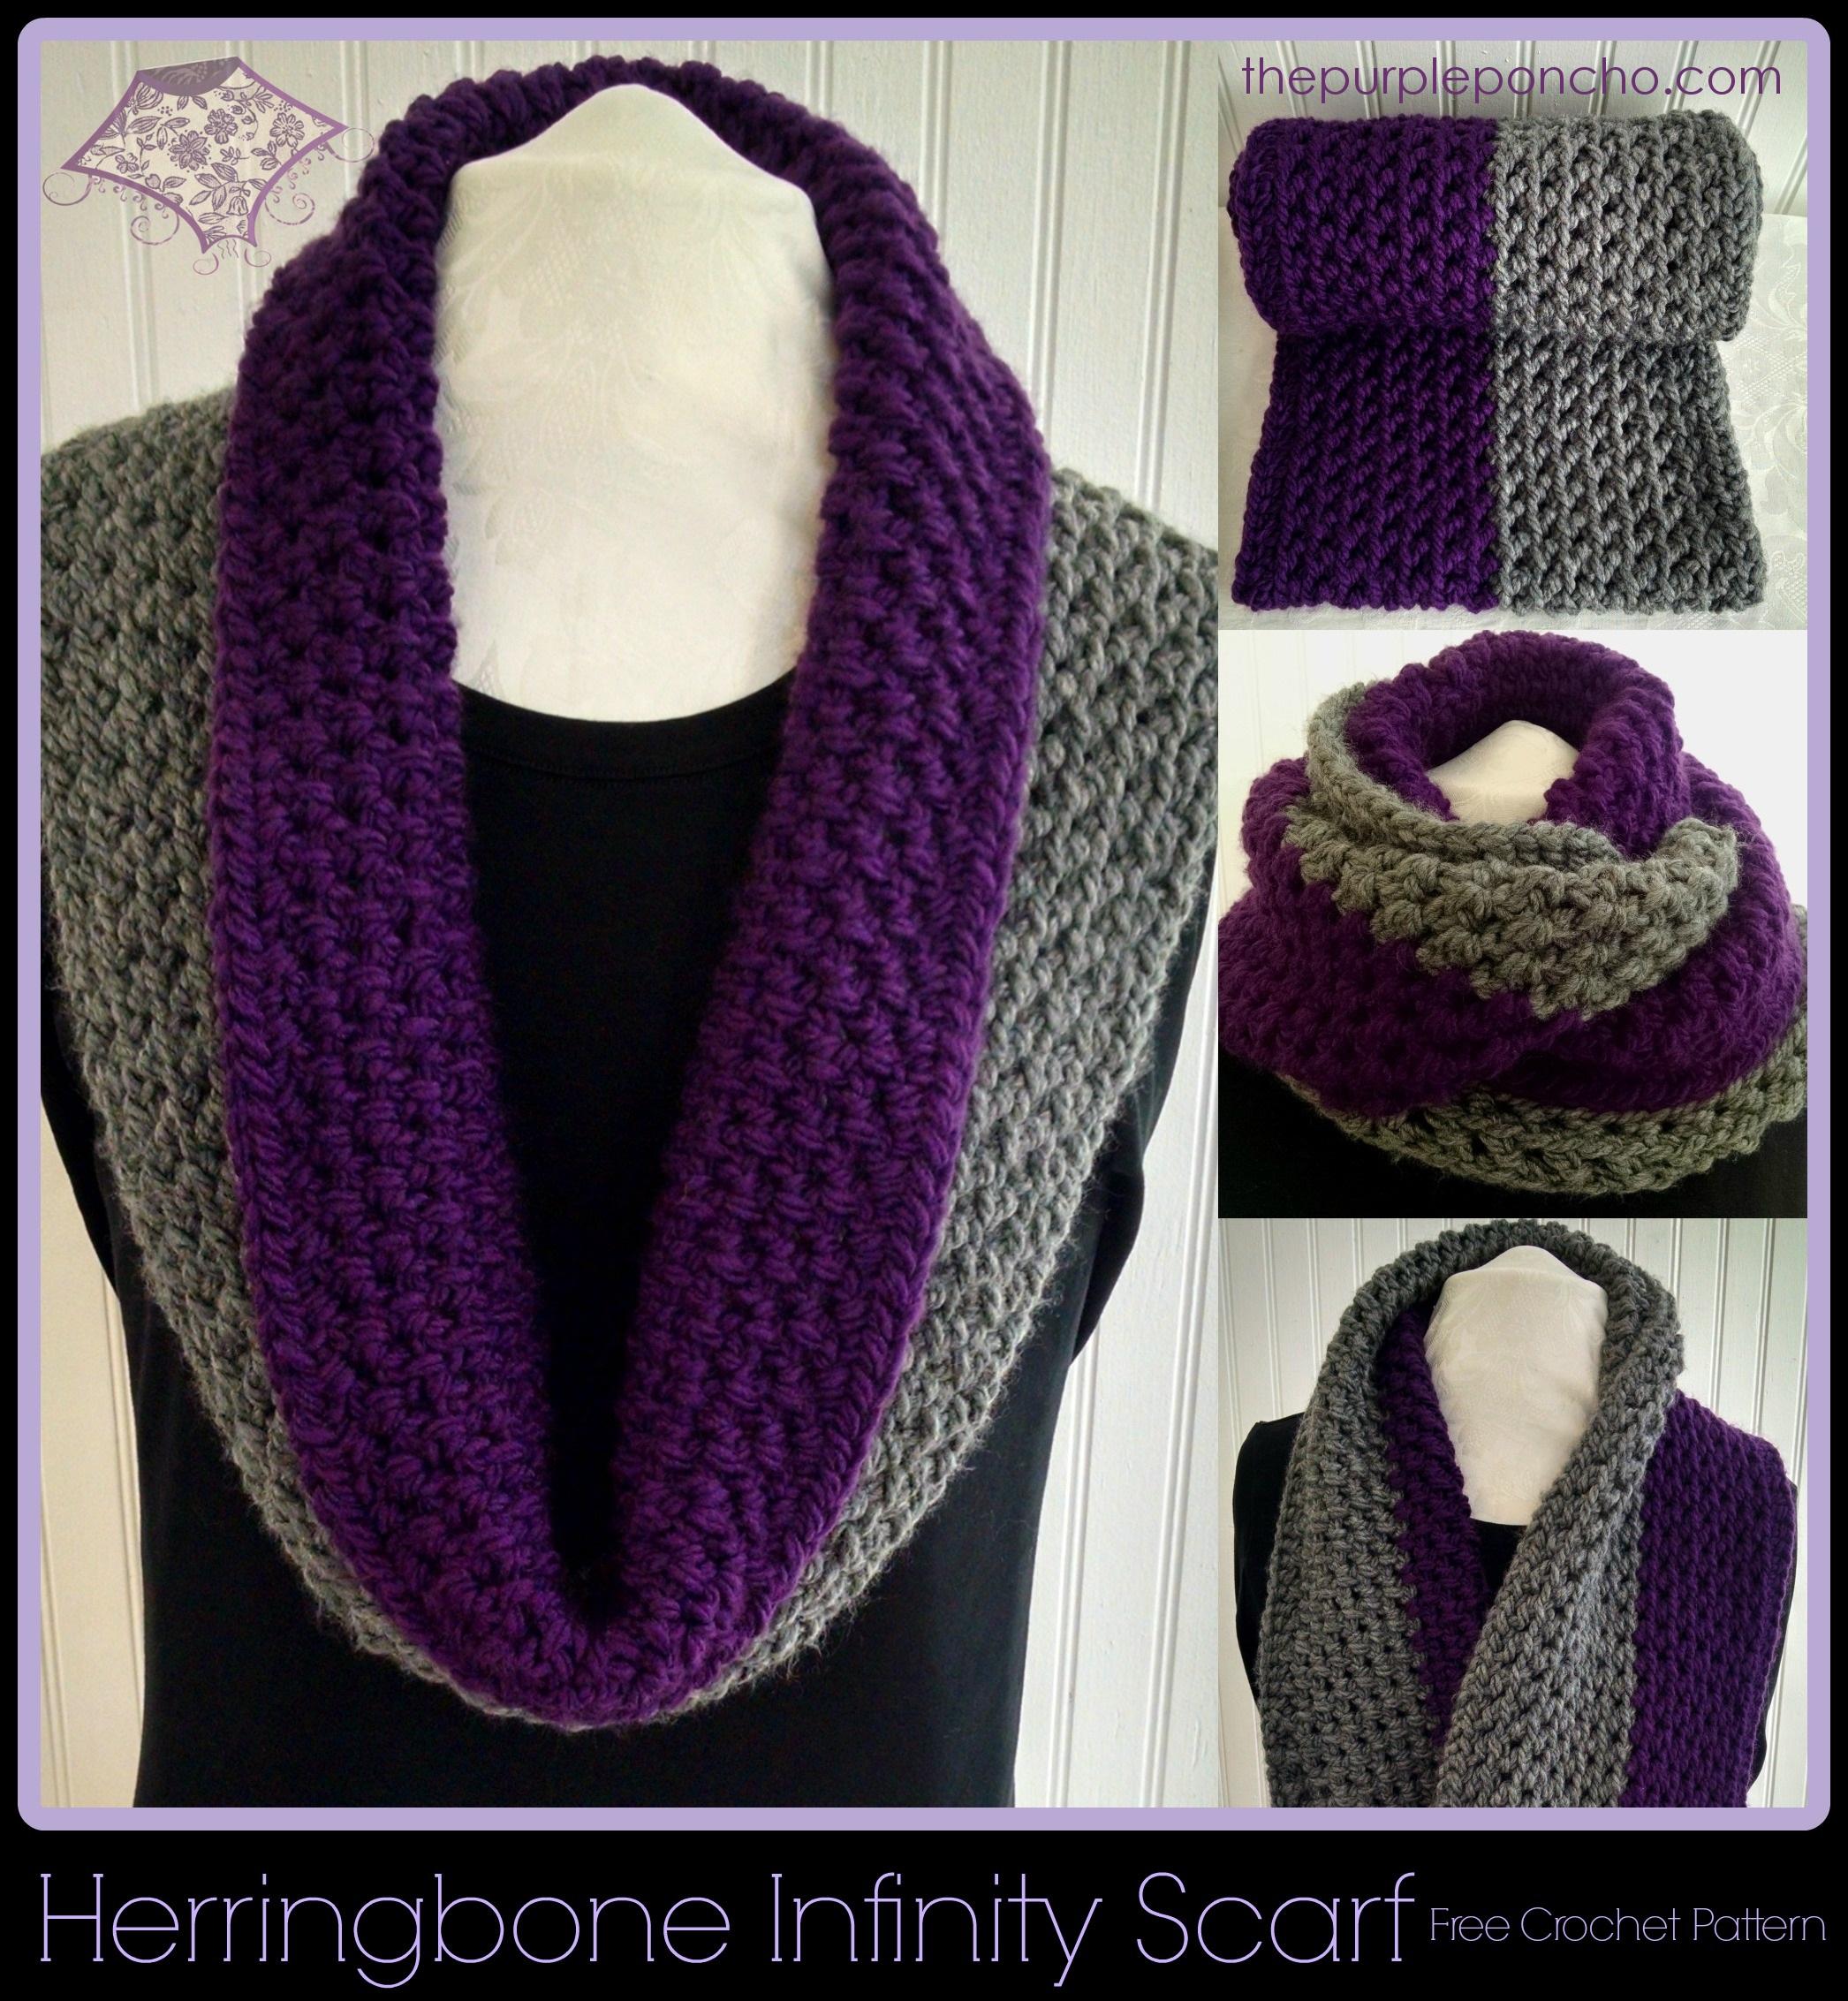 Herringbone Infinity Scarf A Free Crochet Pattern The Purple Poncho